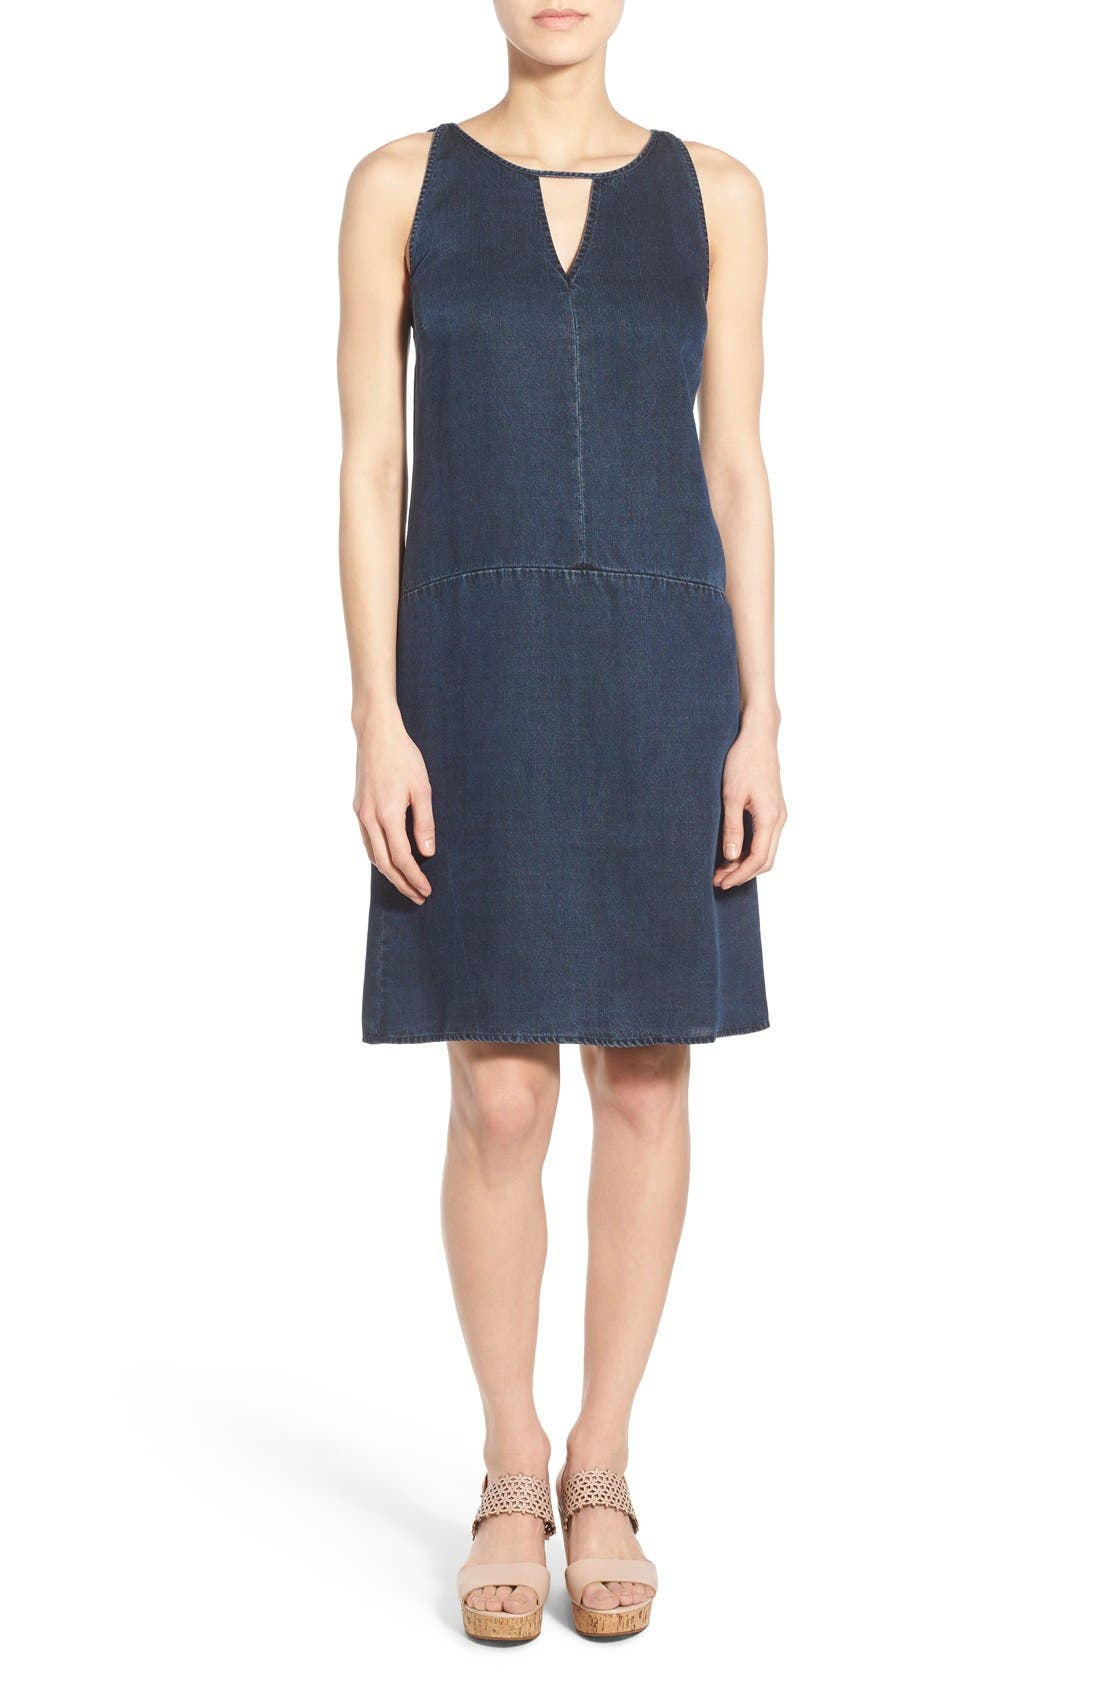 Alternate Image 1 Selected - NIC+ZOE A-Line Denim Shift Dress (Regular & Petite)